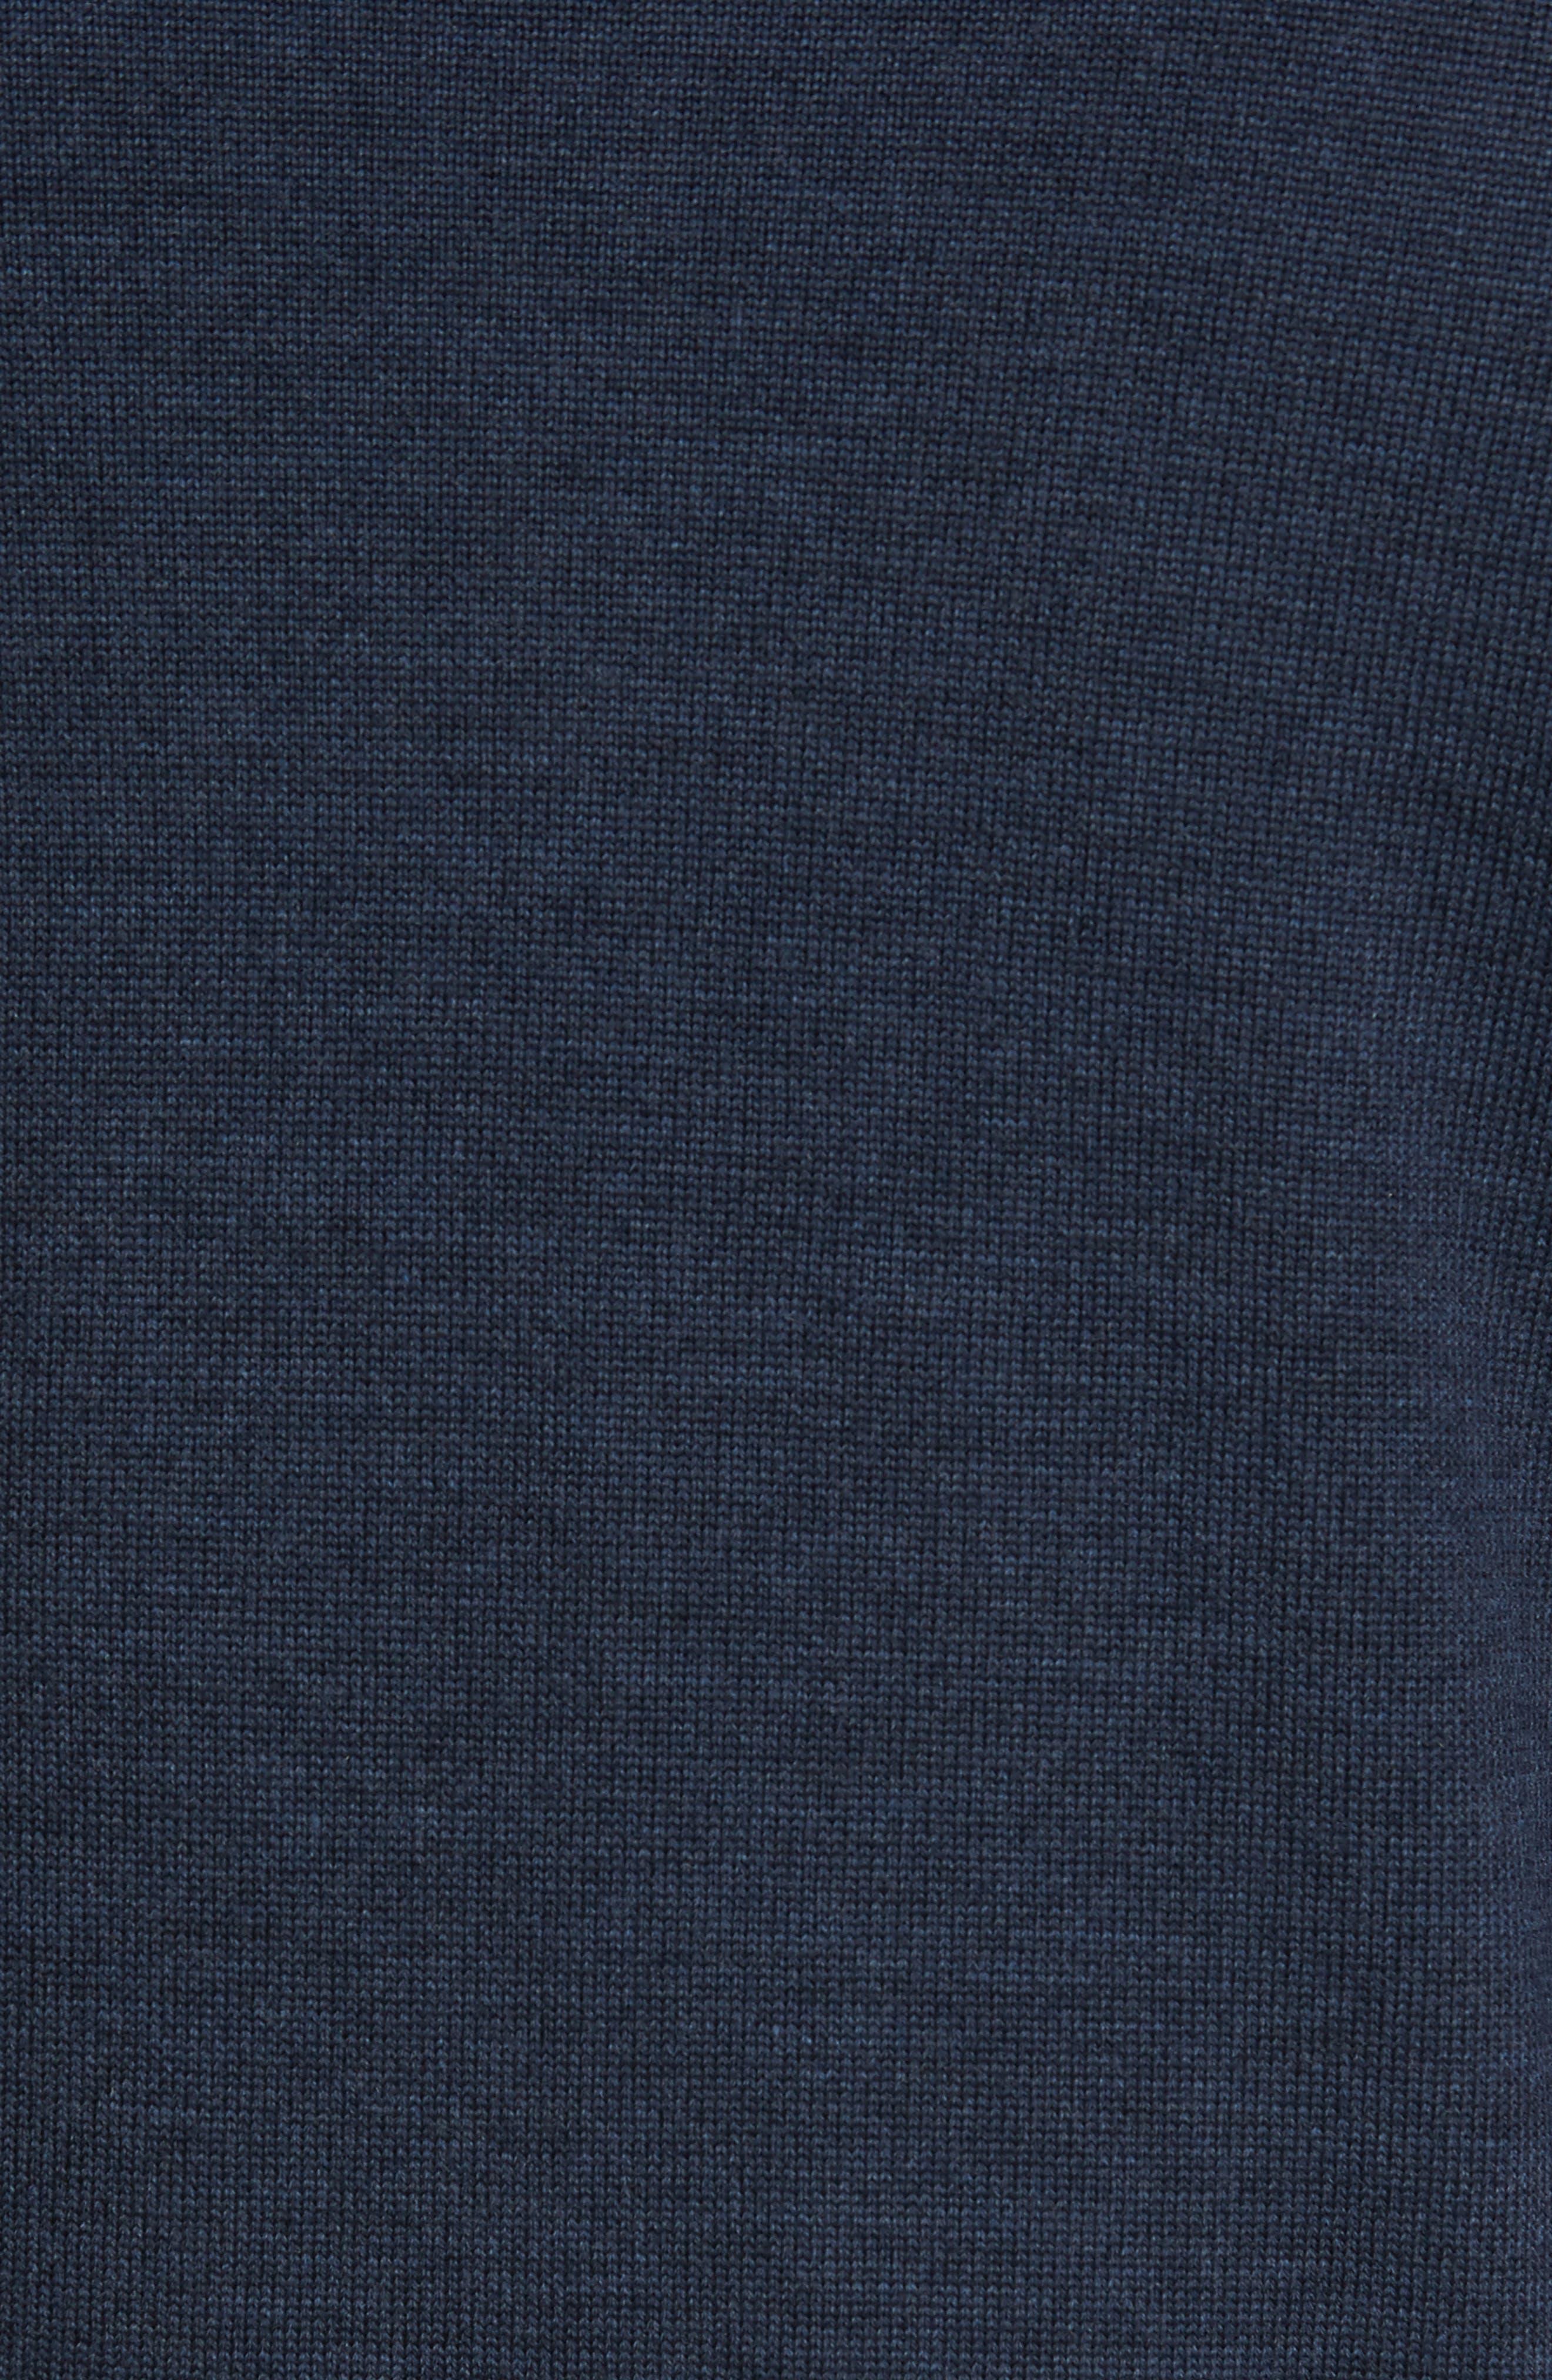 Roaring Meg Zip Wool Sweater,                             Alternate thumbnail 5, color,                             401